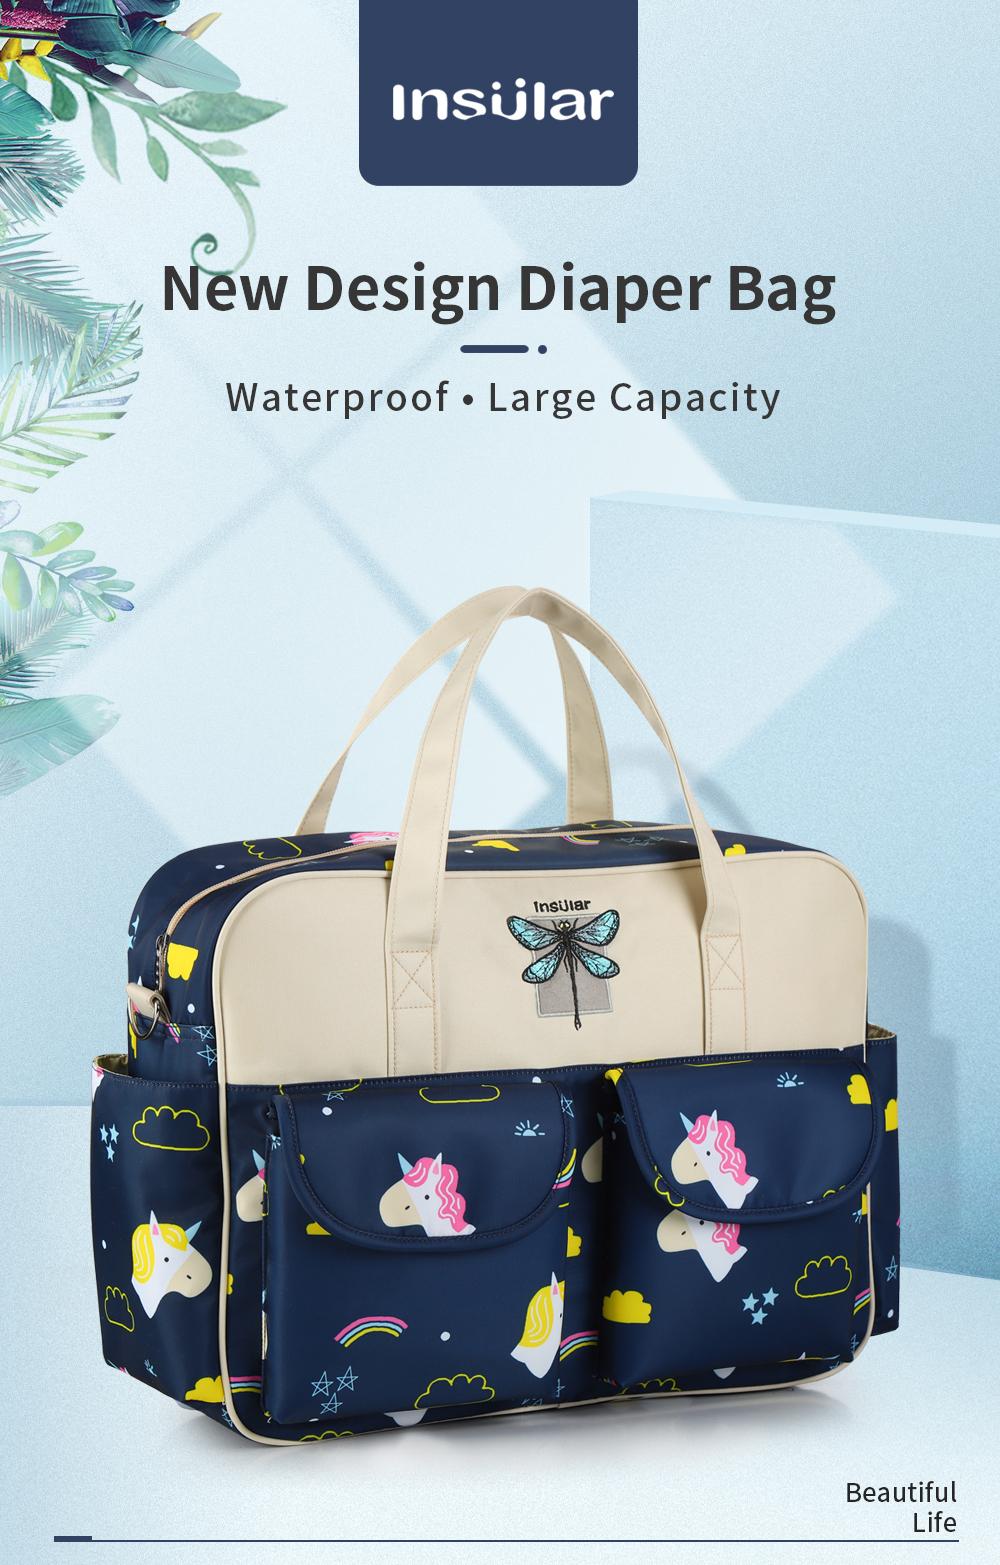 insular diaper bag (1)